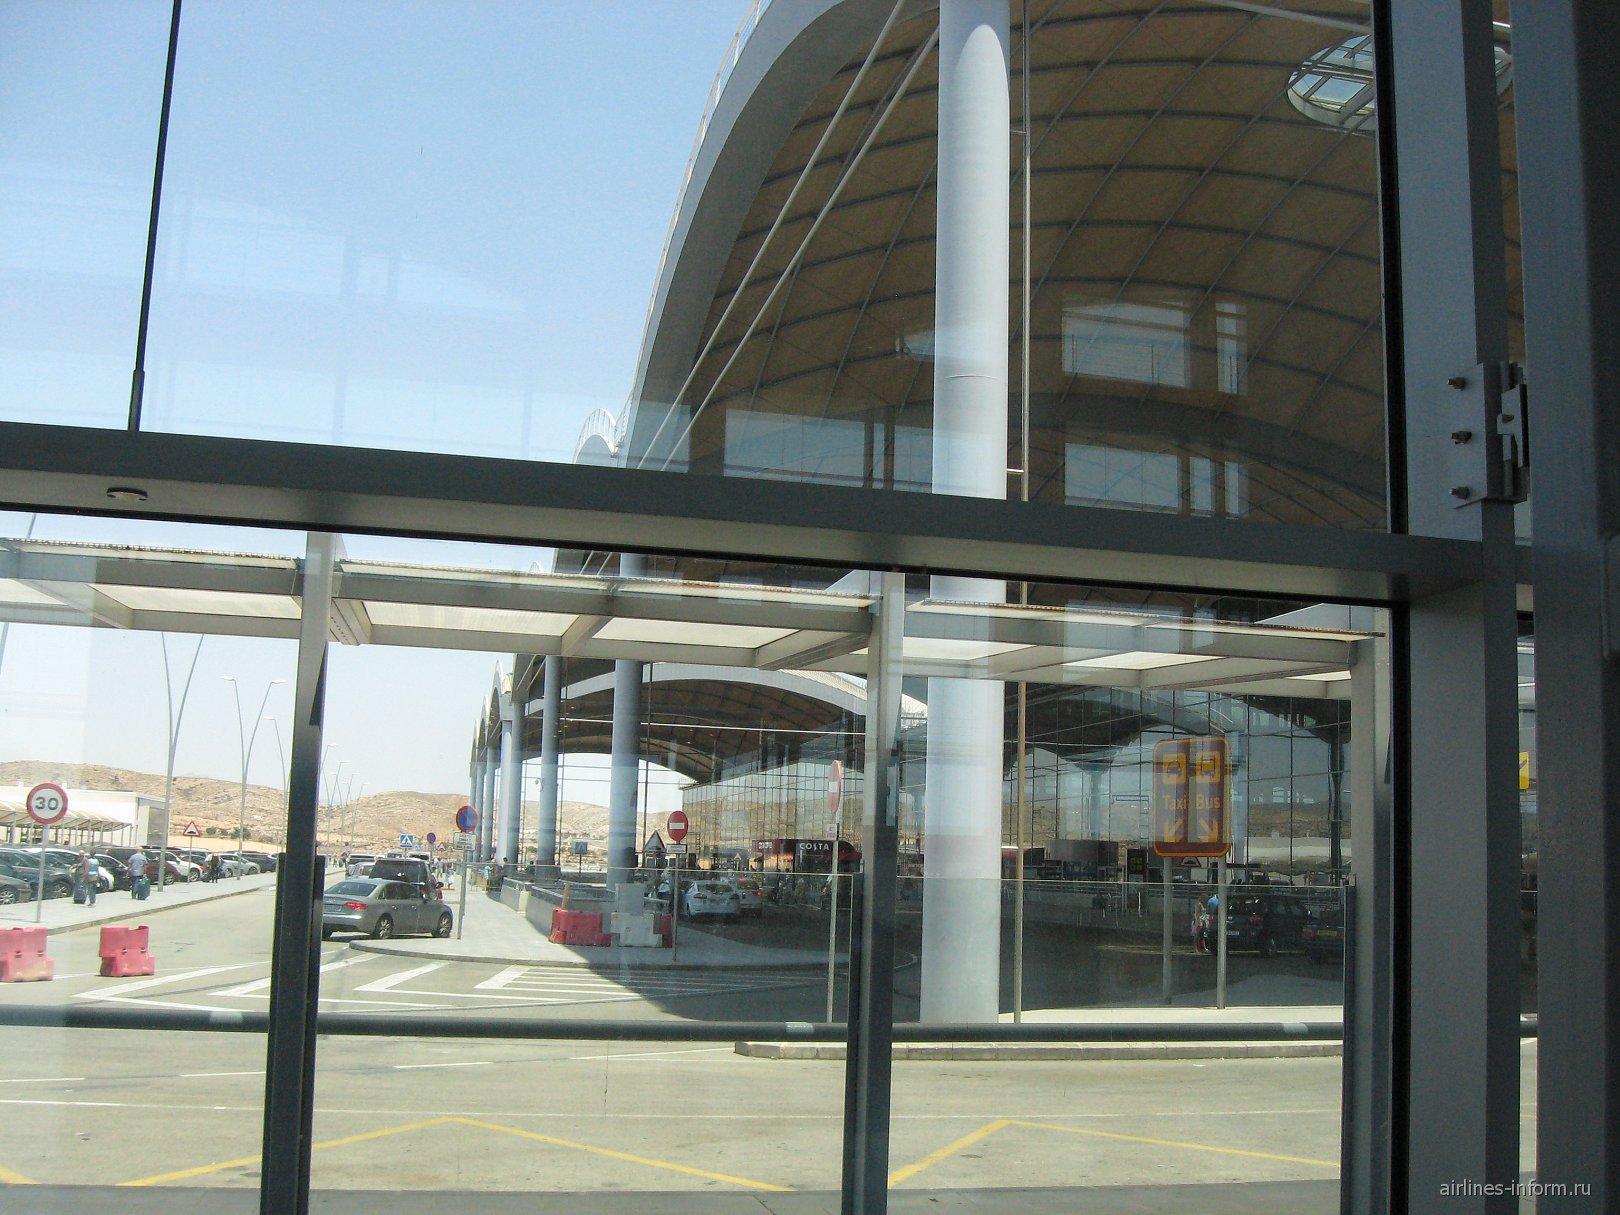 Вид на вход в аэропорт и парковку